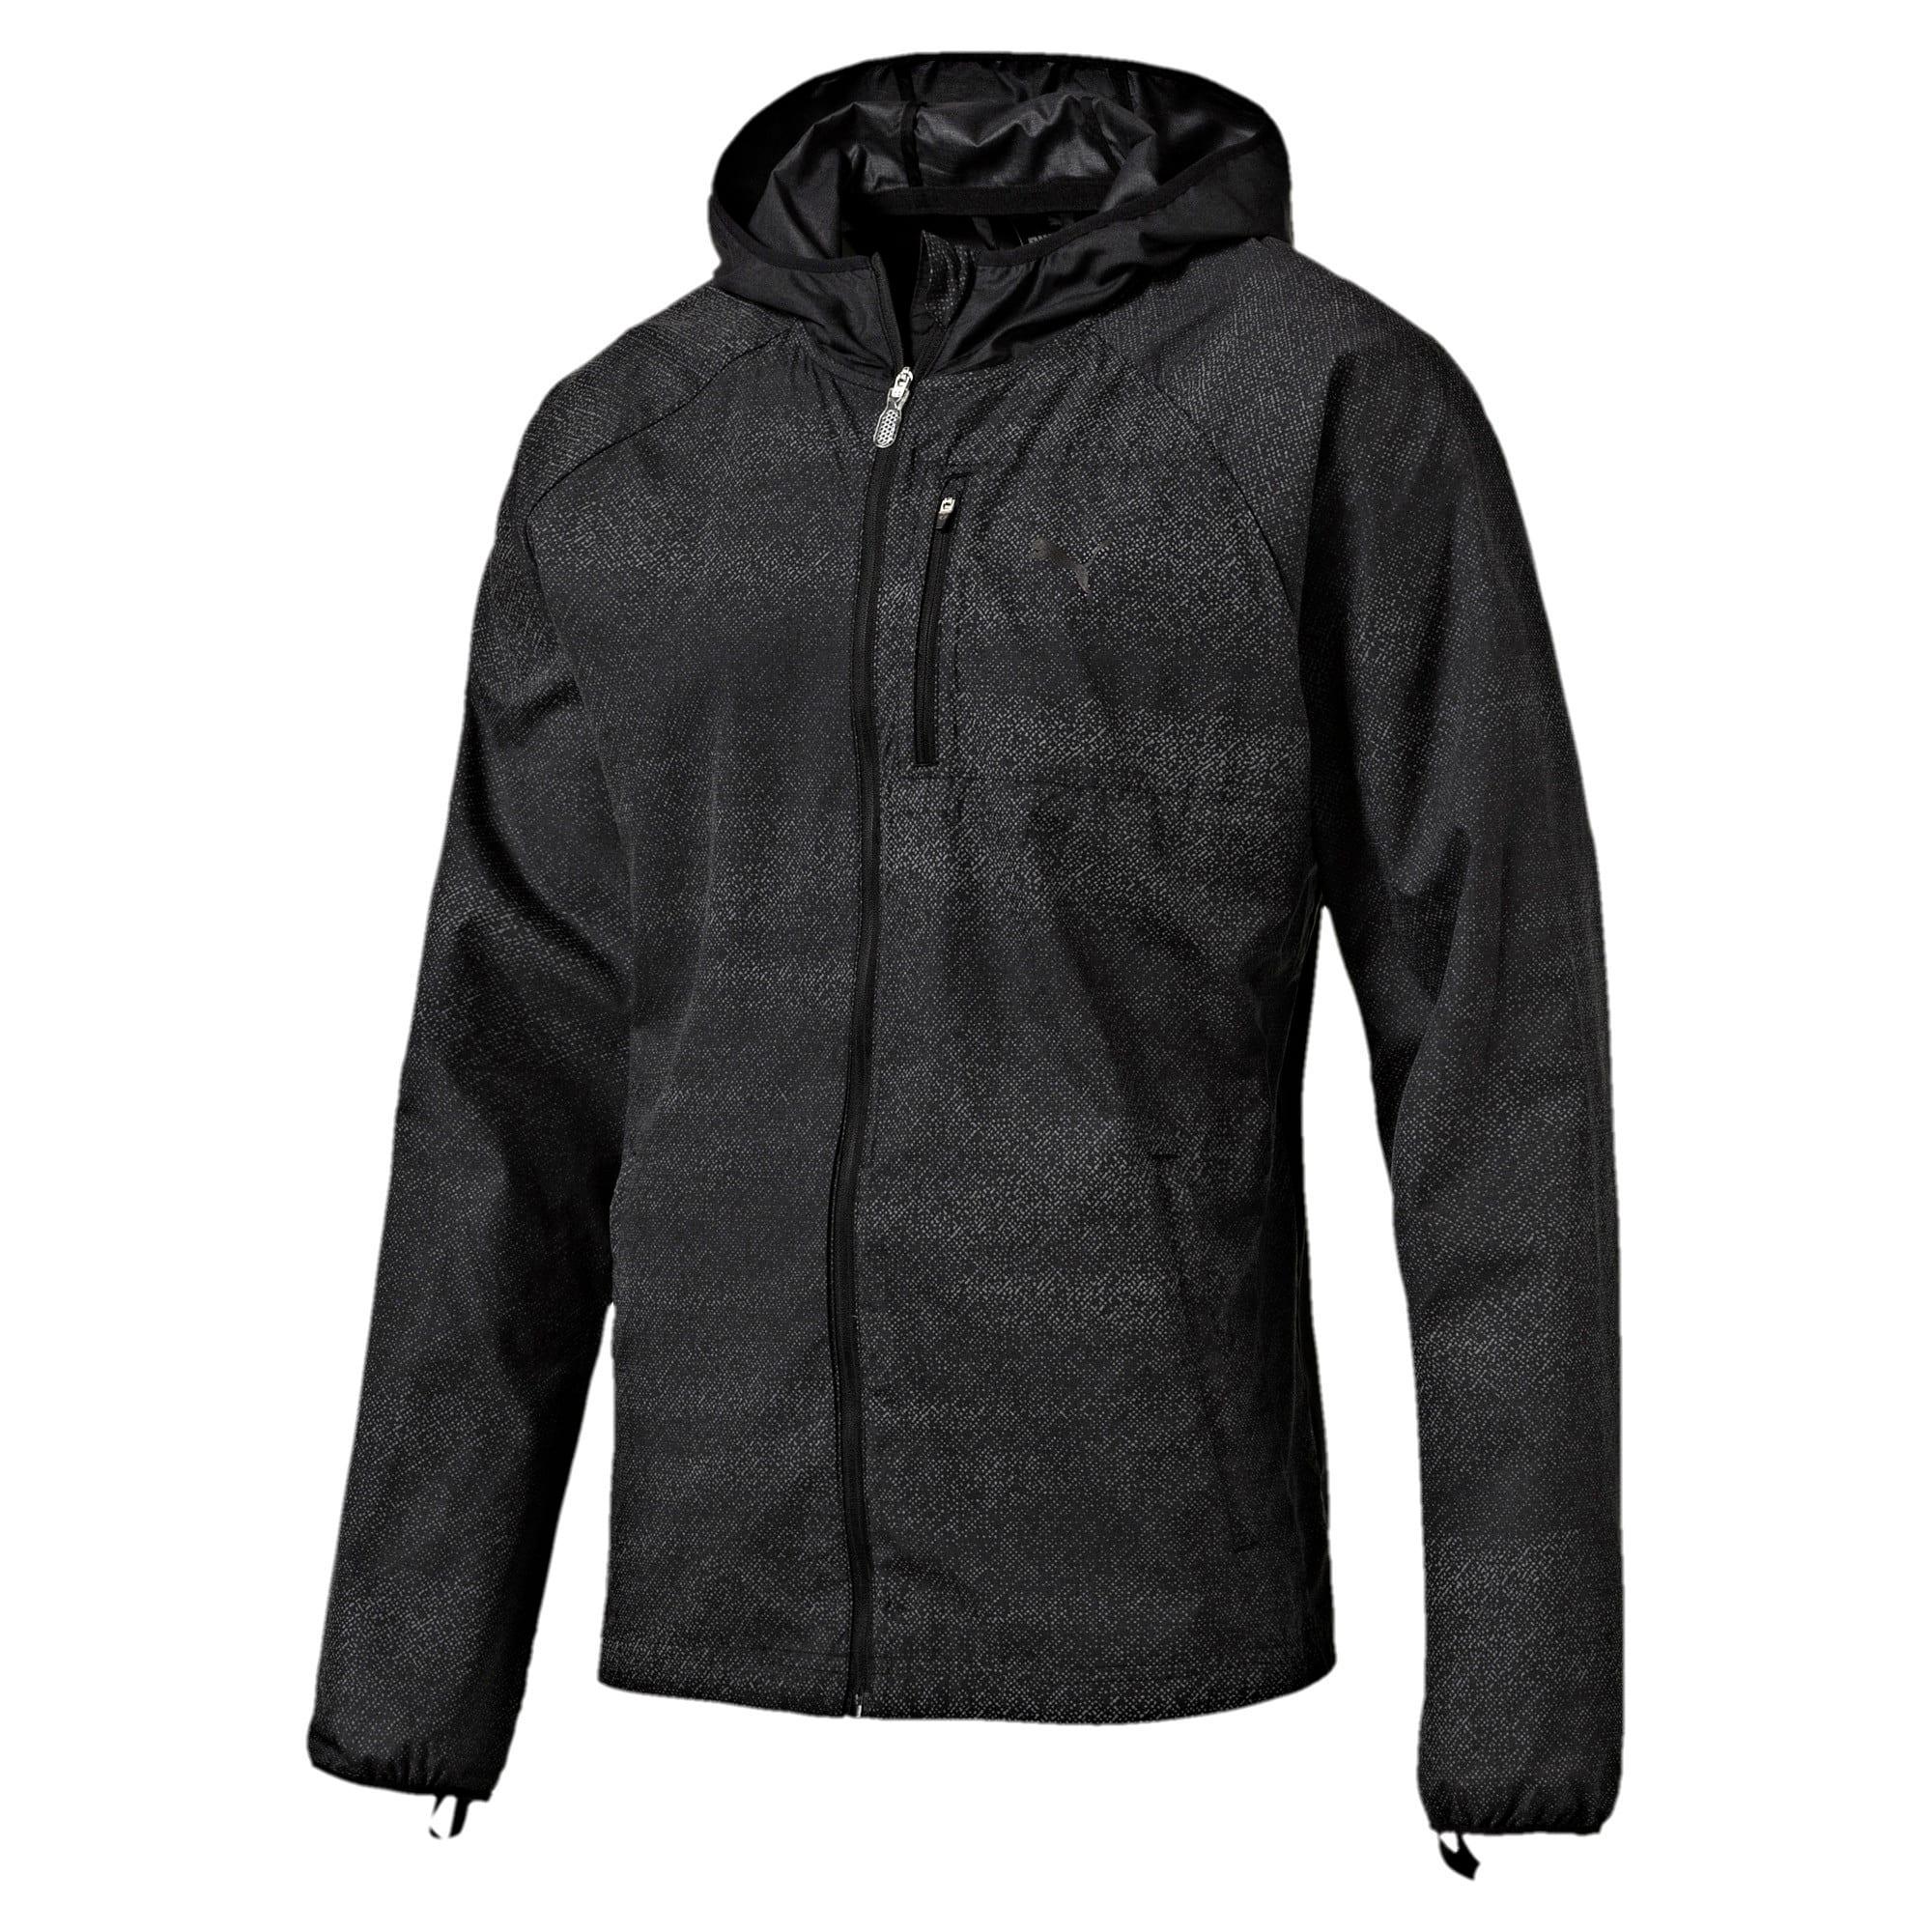 Thumbnail 3 of Running Men's NightCat Jacket, Puma Black Heather, medium-IND